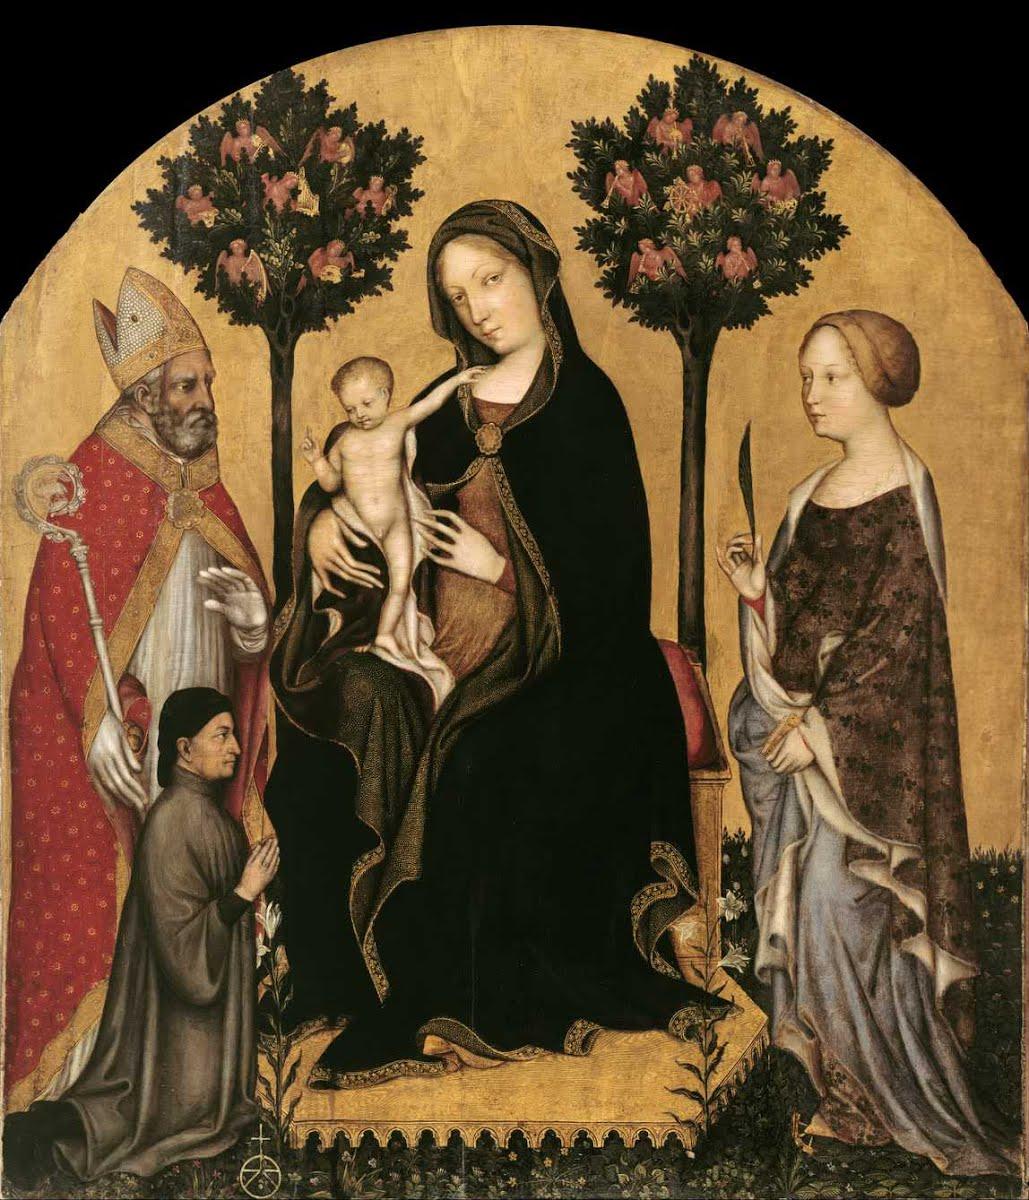 Gentile da Fabriano, Natividad.